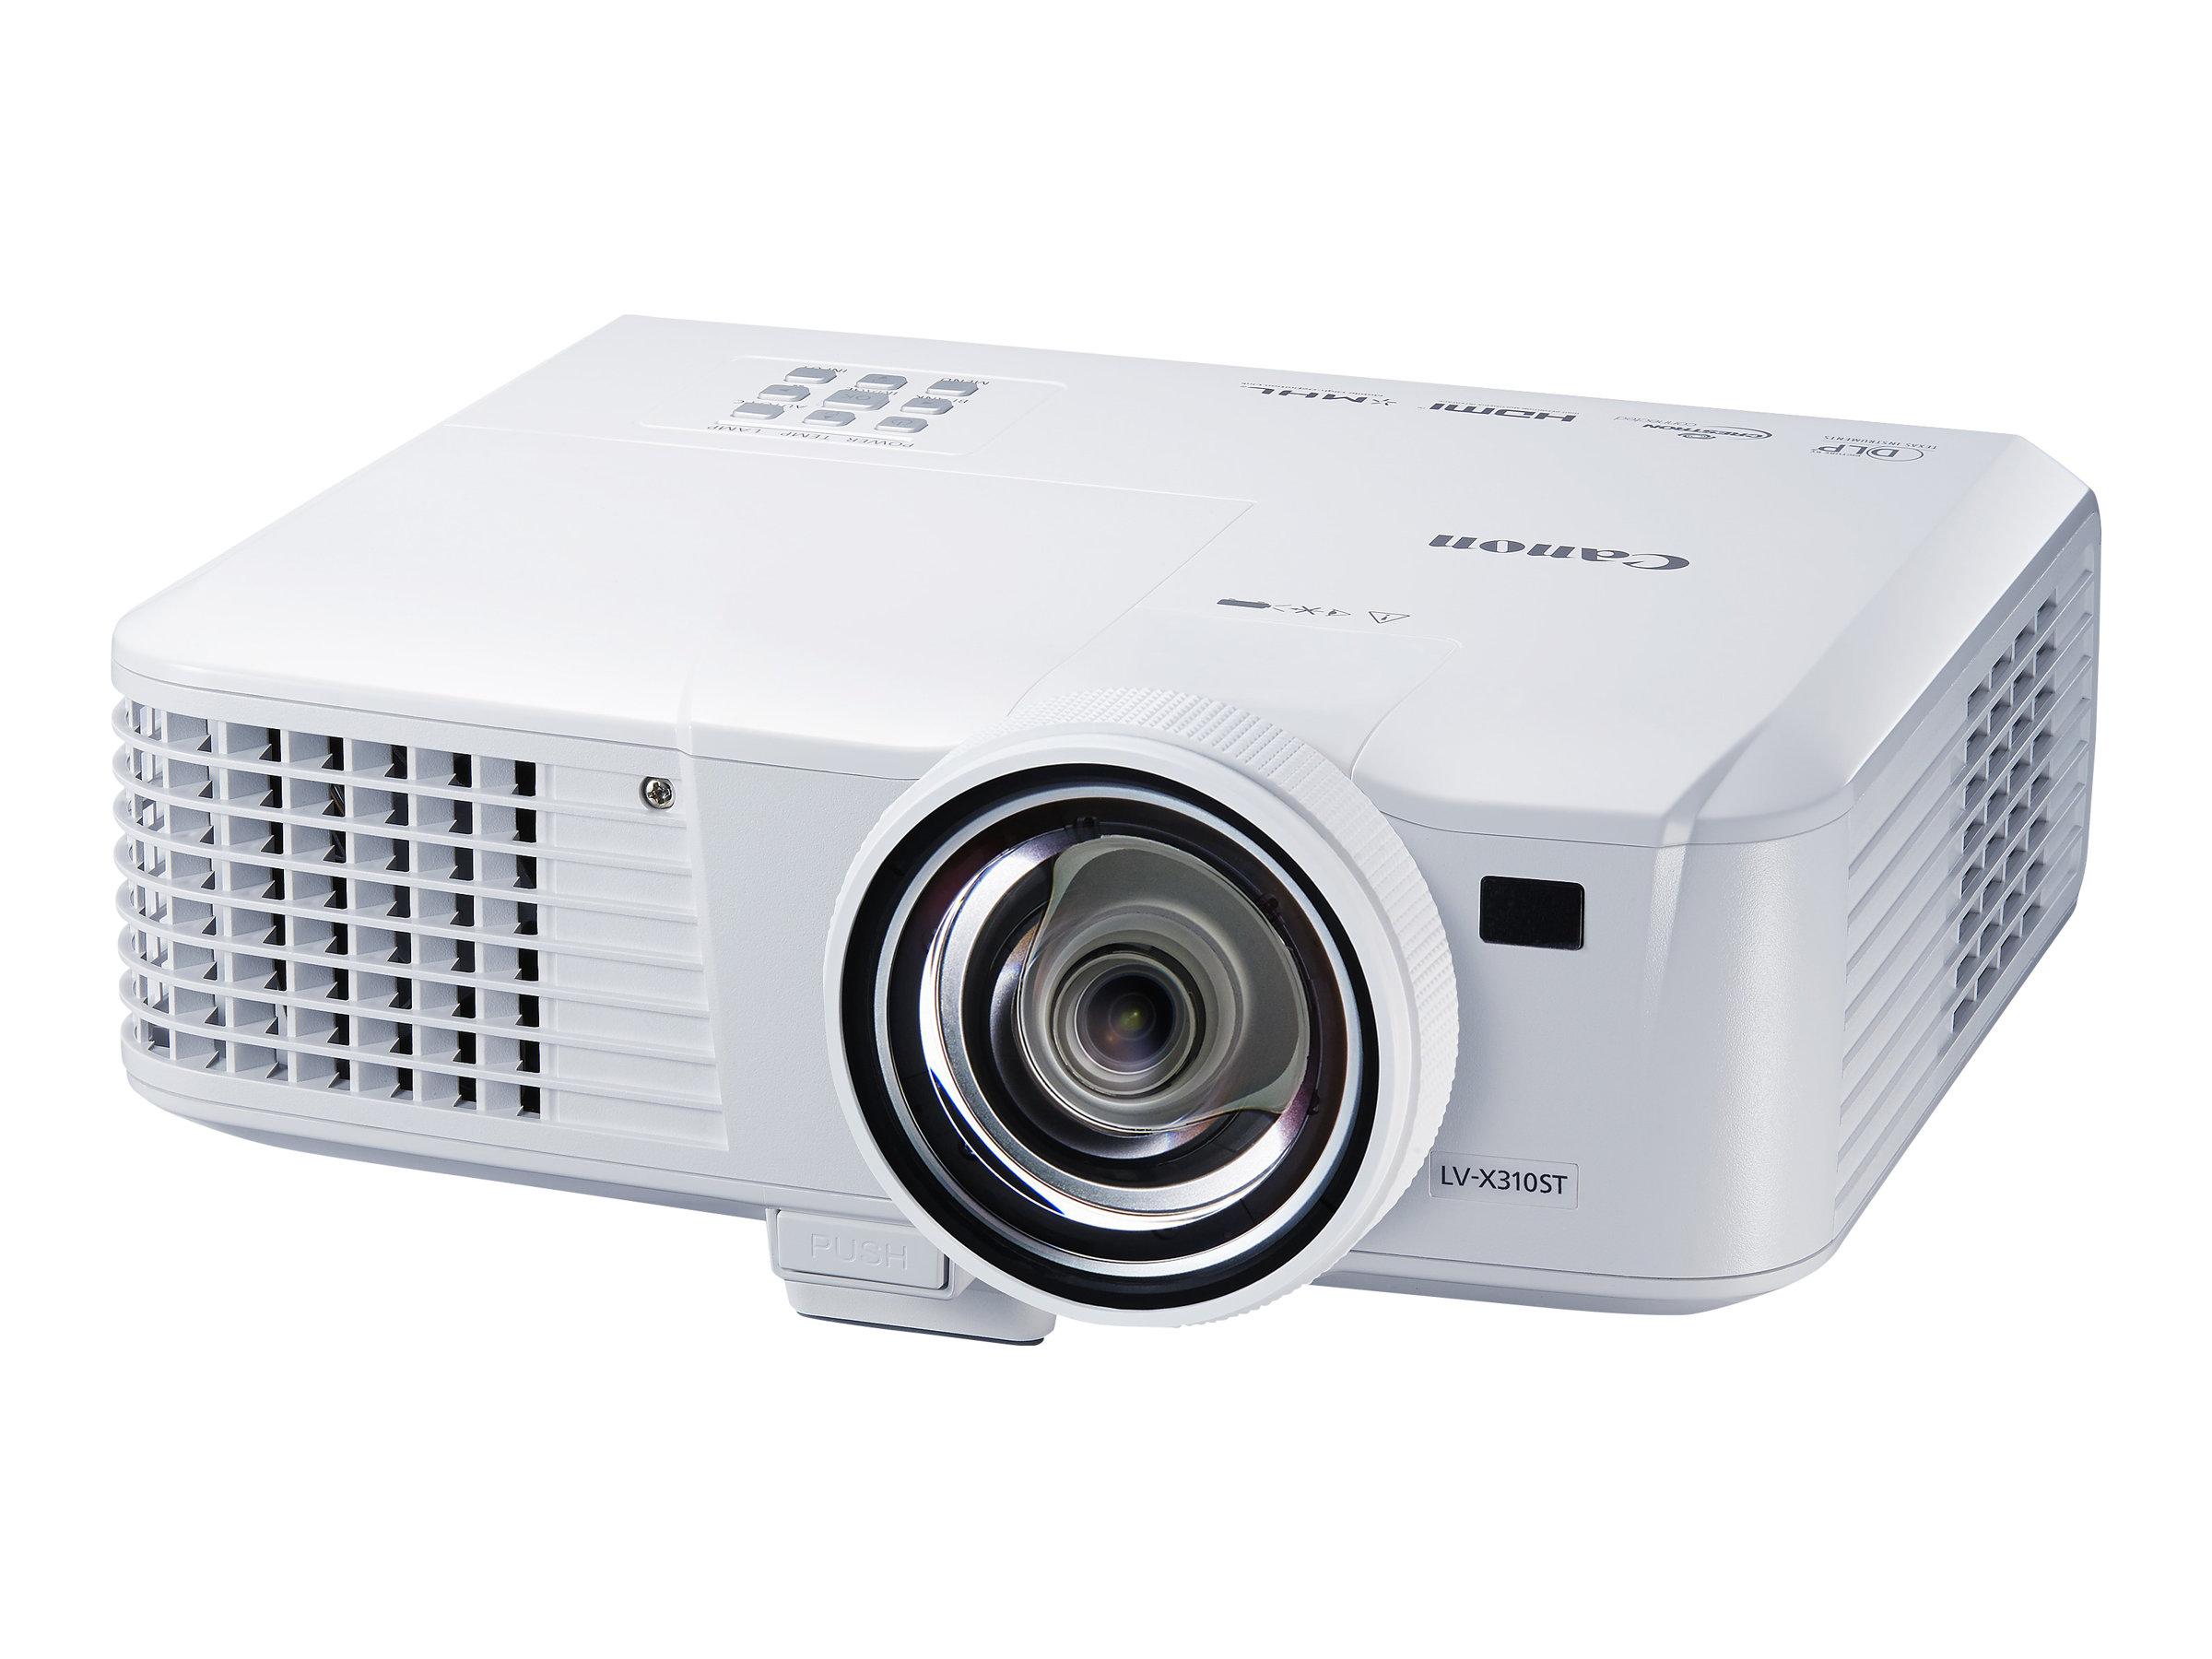 Canon LV-WX310ST - DLP-Projektor - super ultra-Hochdruck Quecksilber - tragbar - 3100 lm - WXGA (1280 x 800)